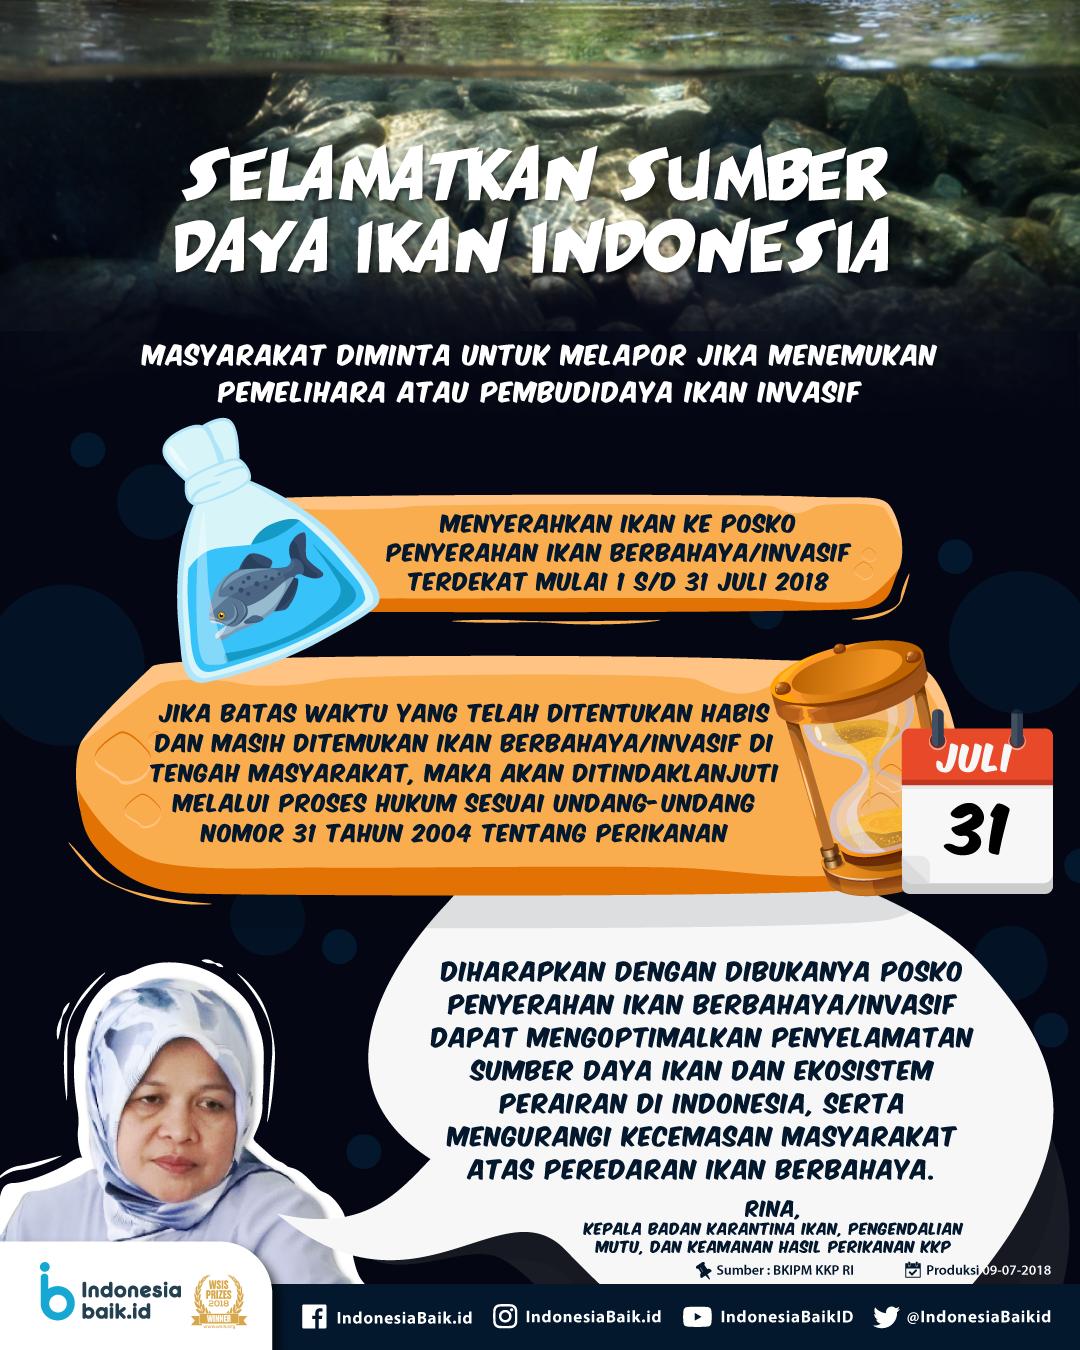 Selamatkan Sumber Daya Ikan Indonesia!